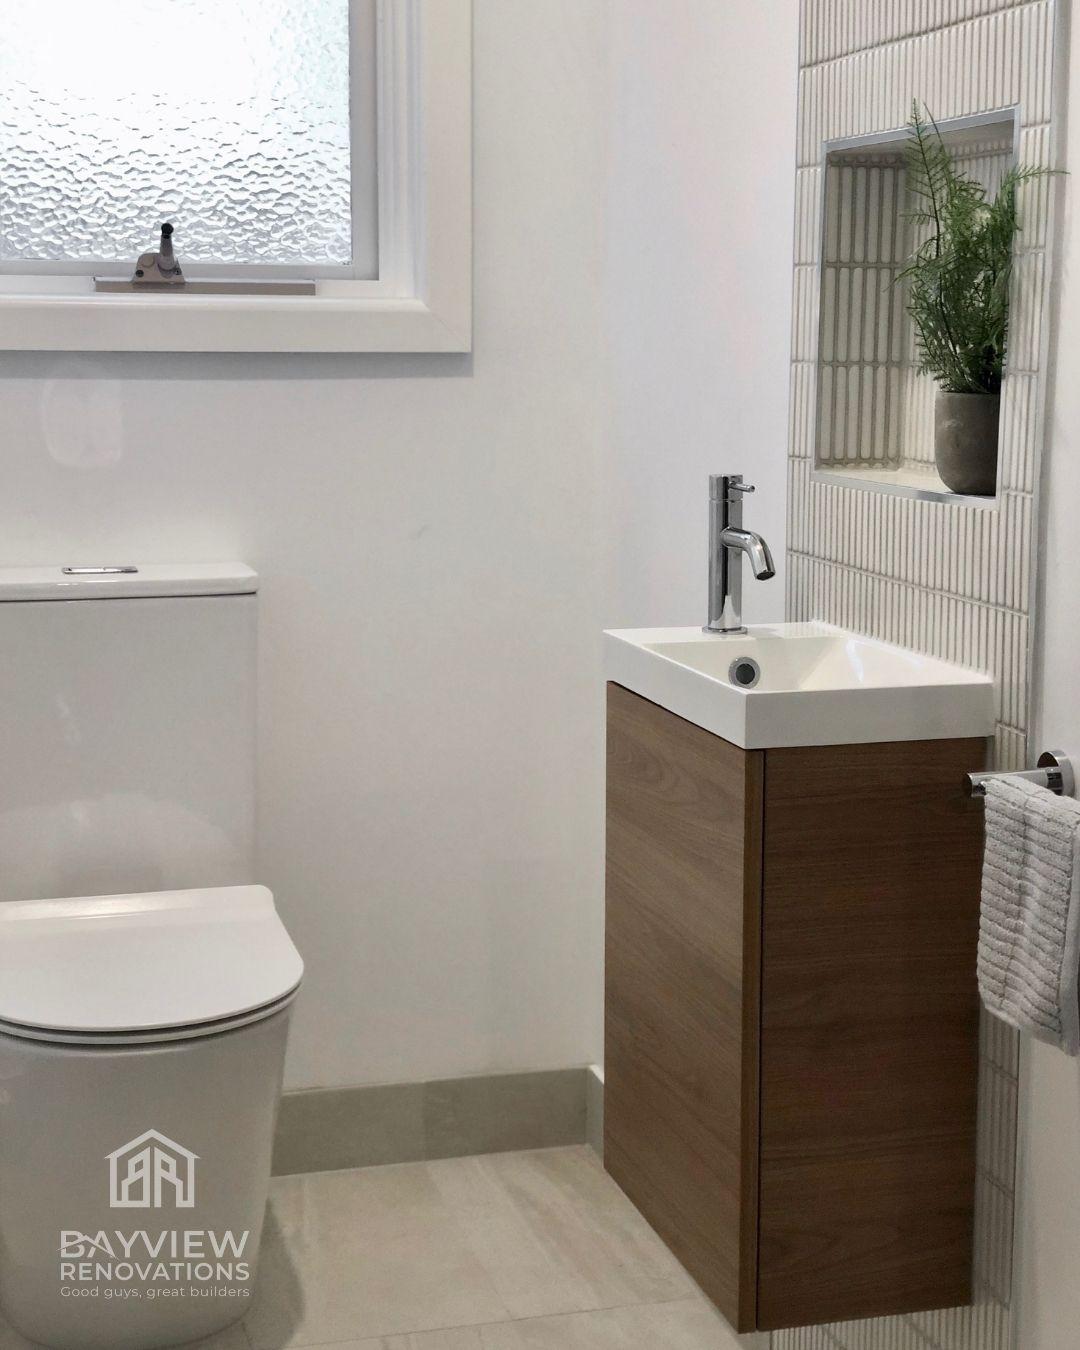 Beaumaris - Hilton Street - Powder Room - Bayview Renovations